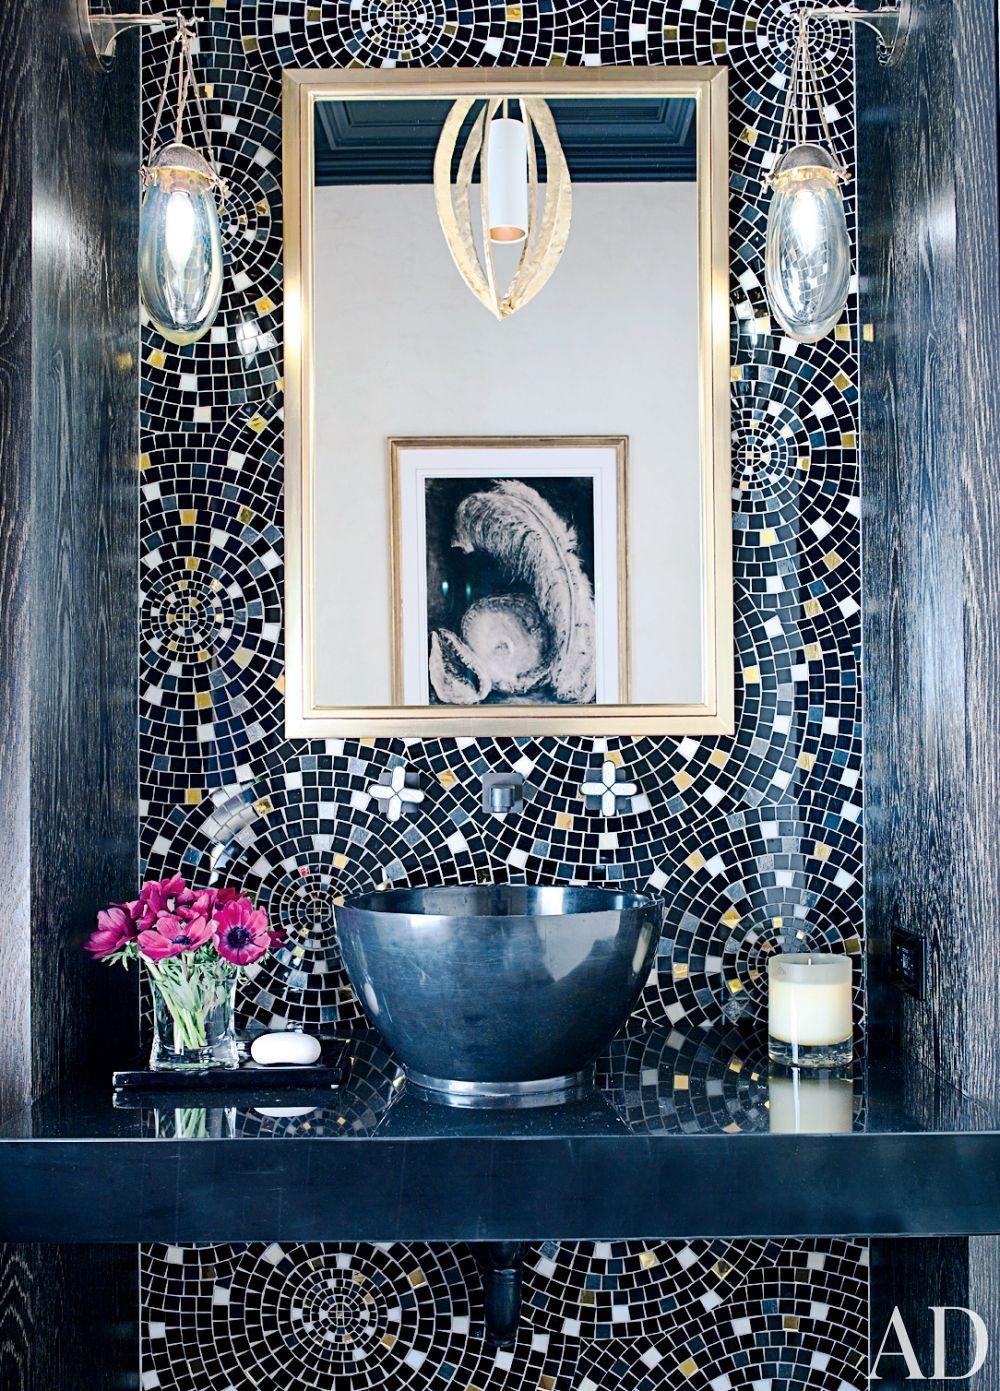 contemporary-bathroom-drake-design-associates-new-york-new-york-201209_1000-watermarked.jpg